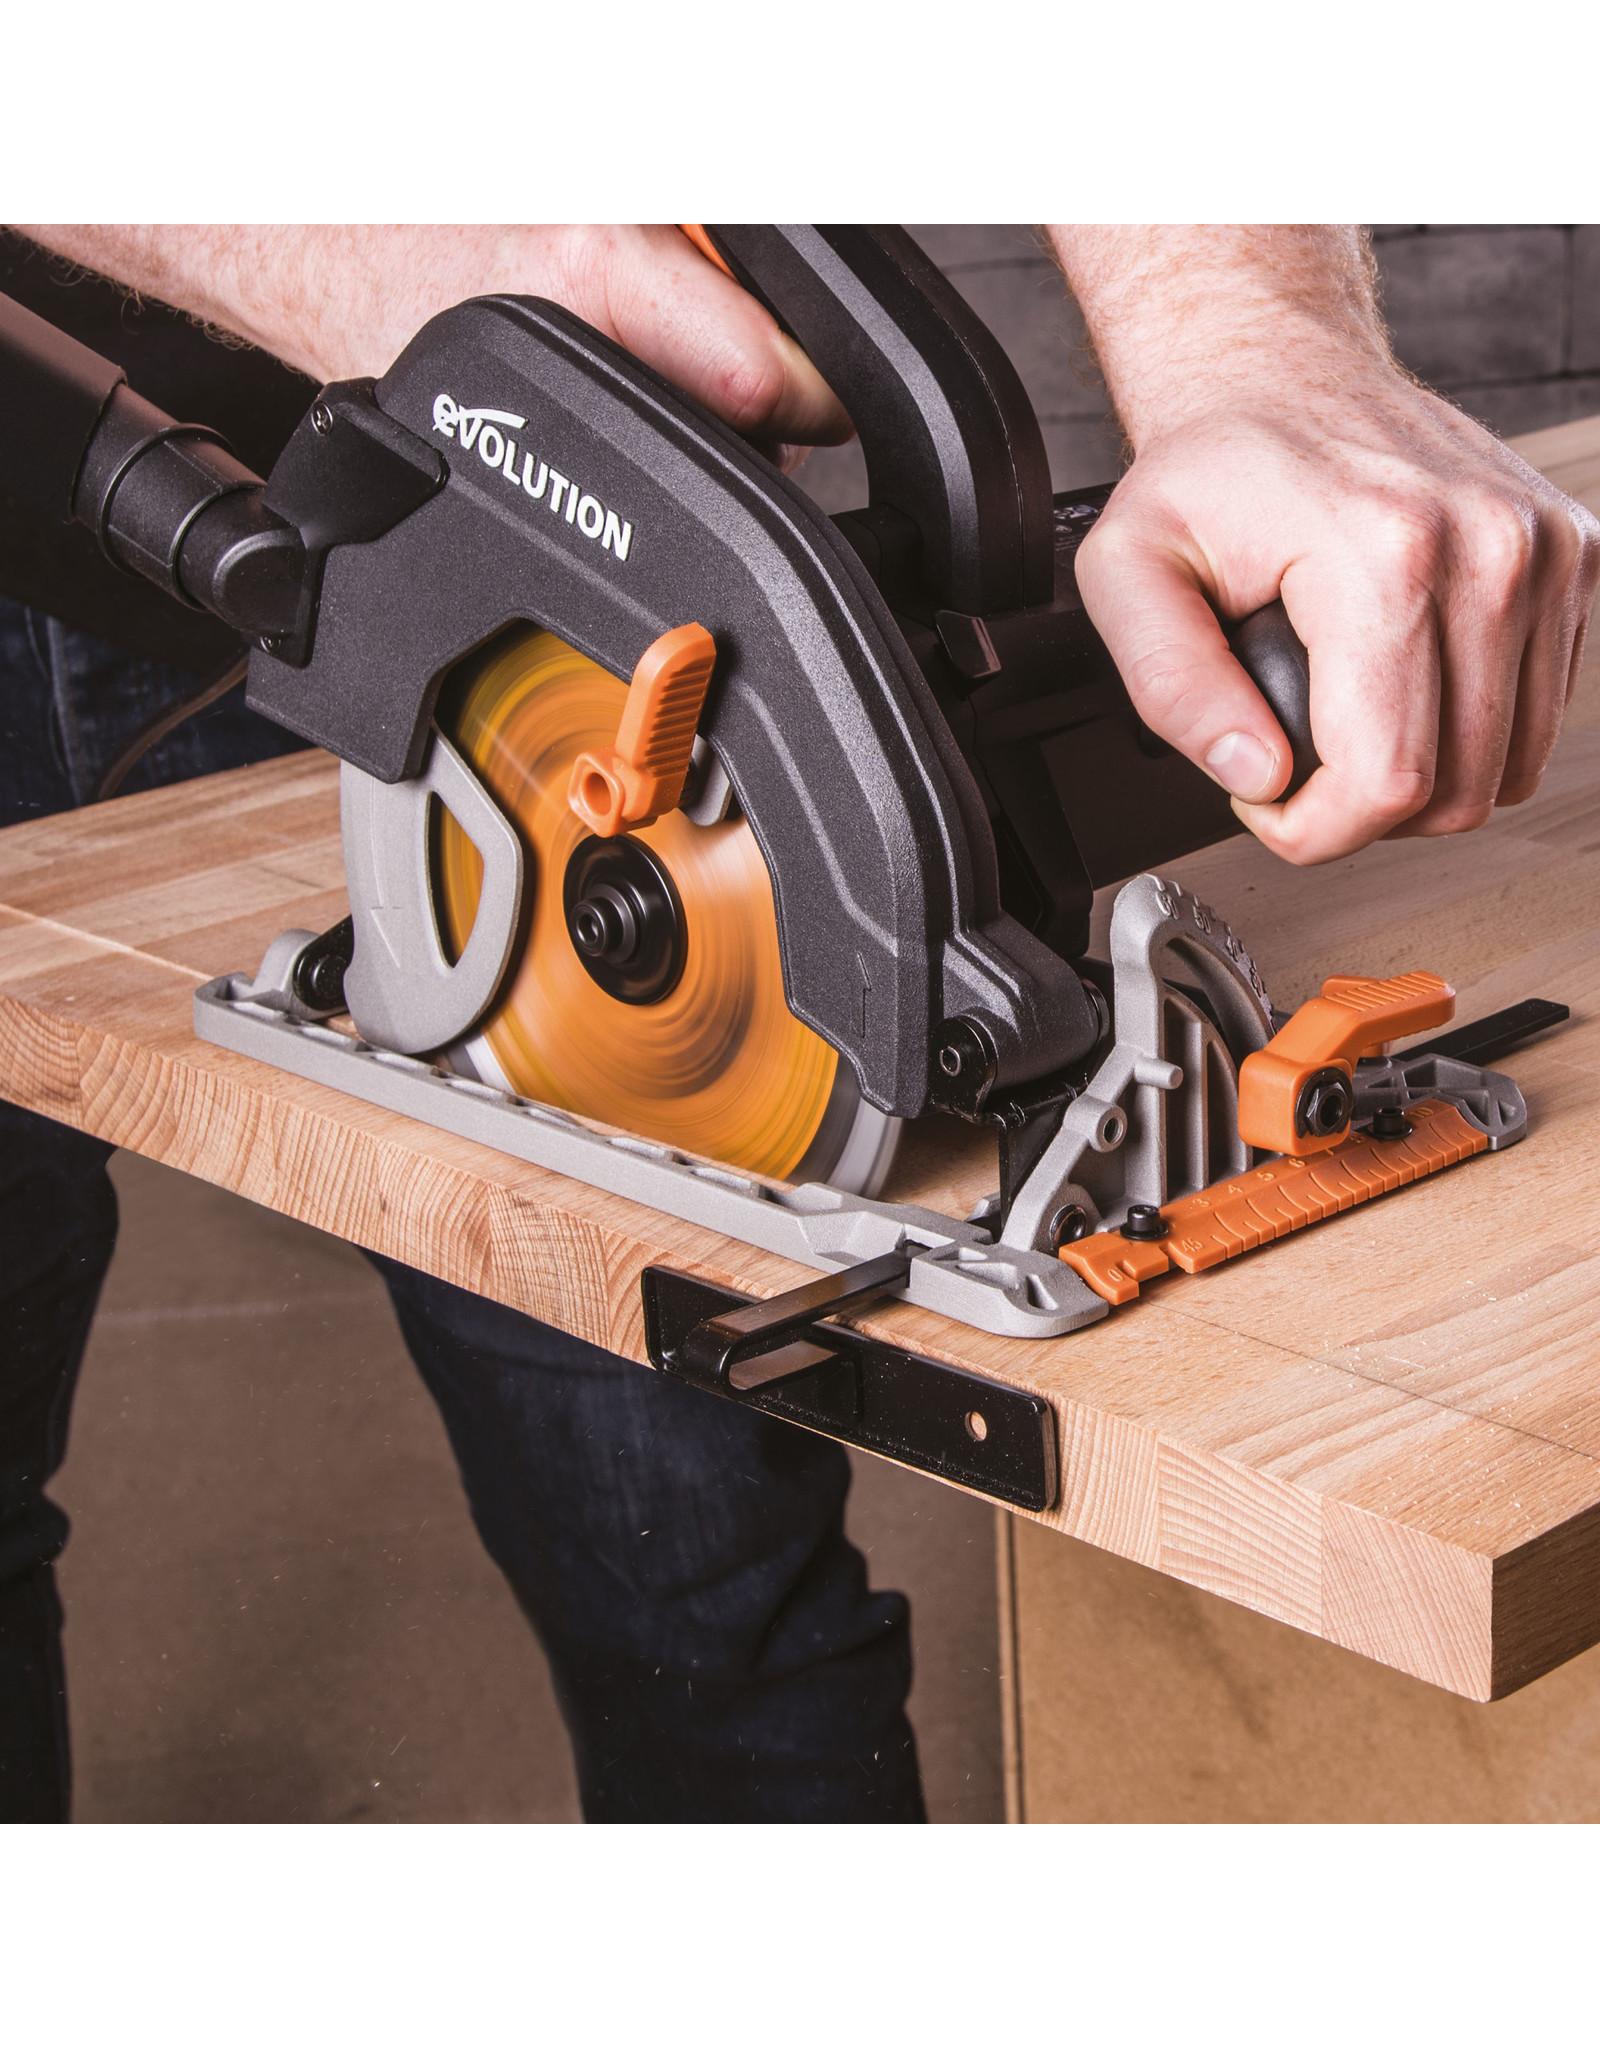 Evolution Power Tools Build Line MULTI-MATERIAL RUNDSÄGE RAGE R185 CCS